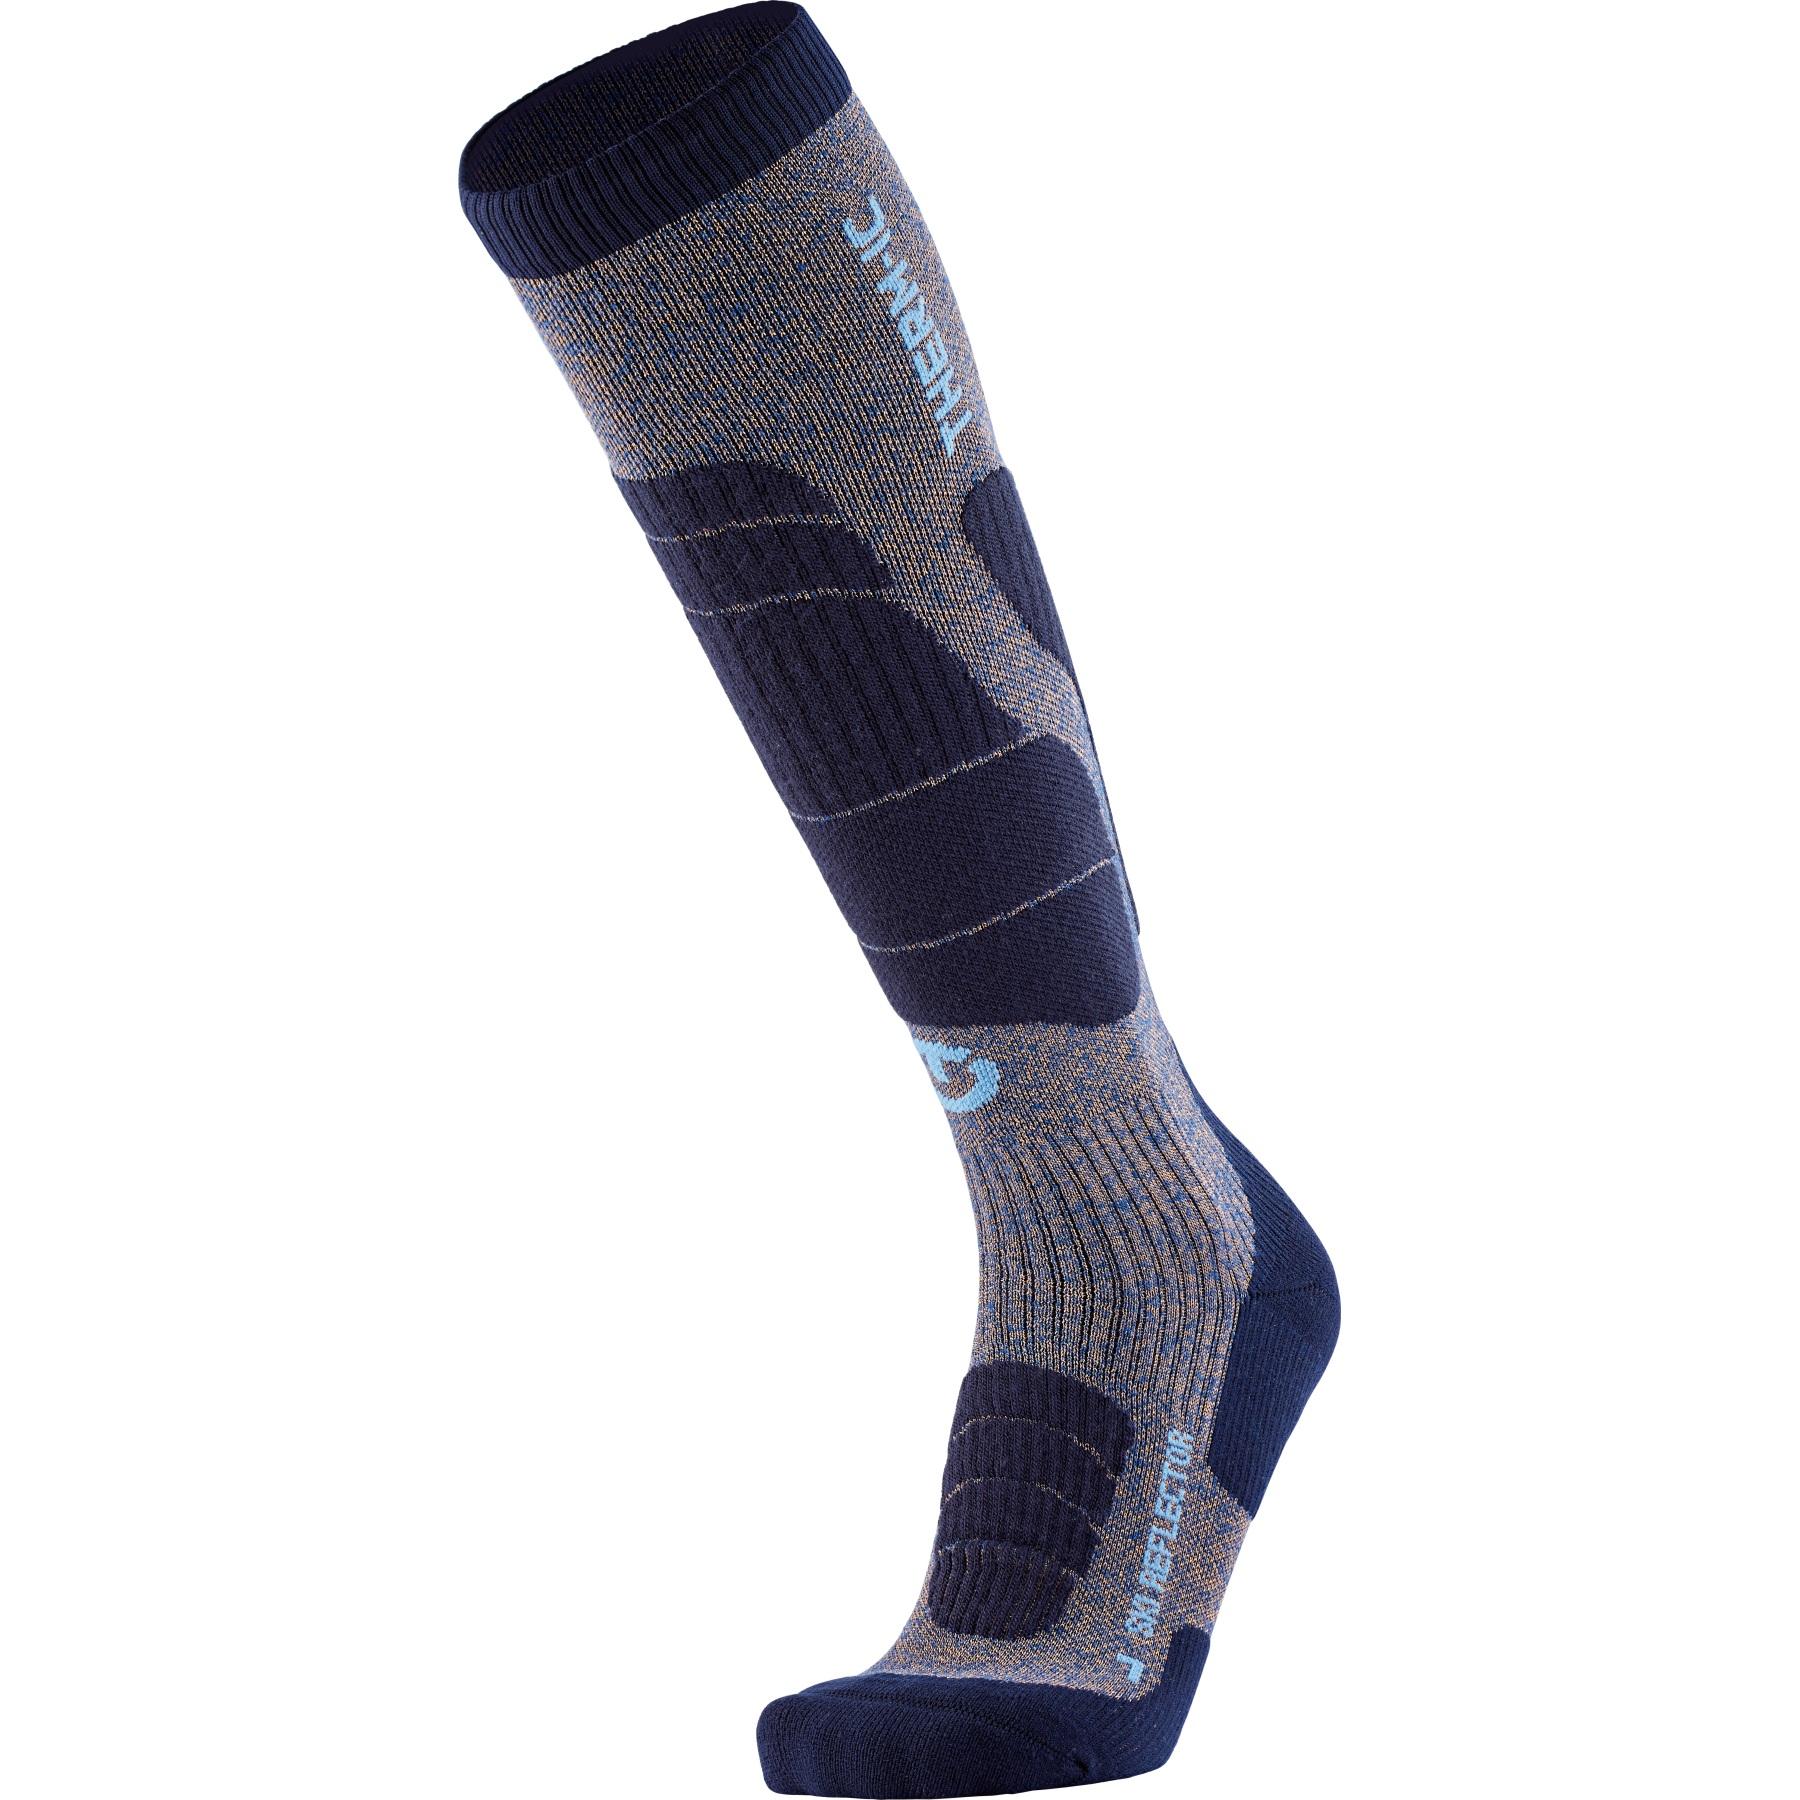 therm-ic Ski Merino Reflector Men Socken - Blau/Gold